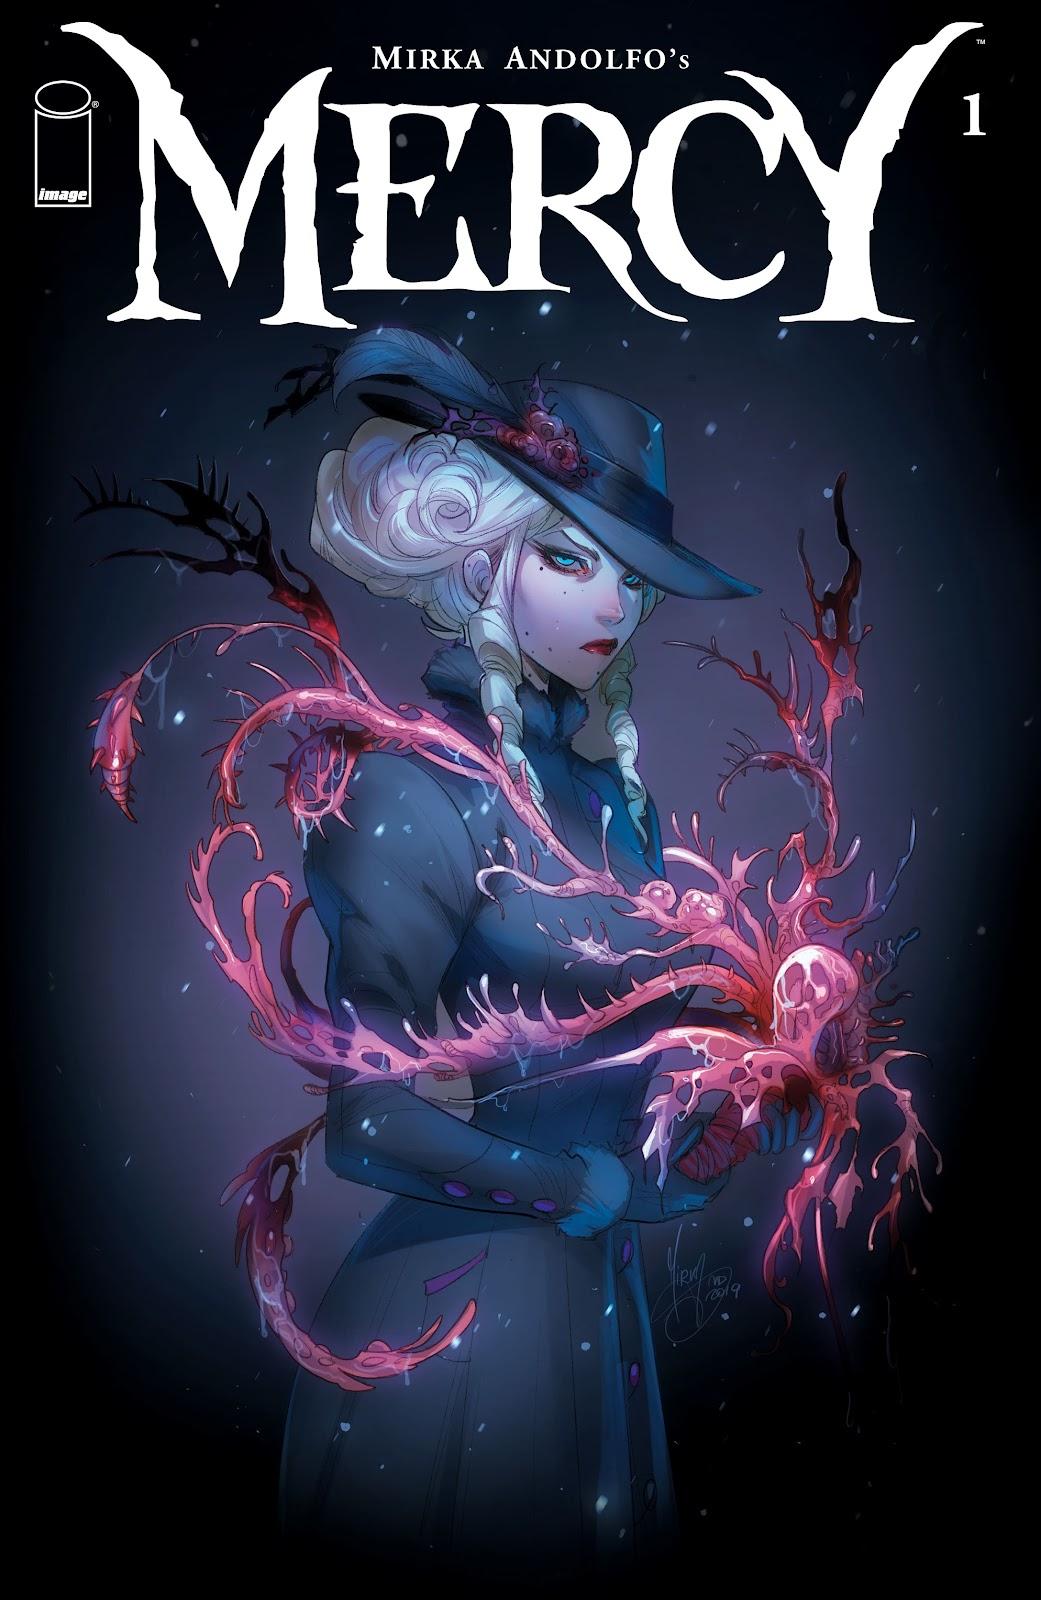 Read online Mirka Andolfo's Mercy comic -  Issue #1 - 1